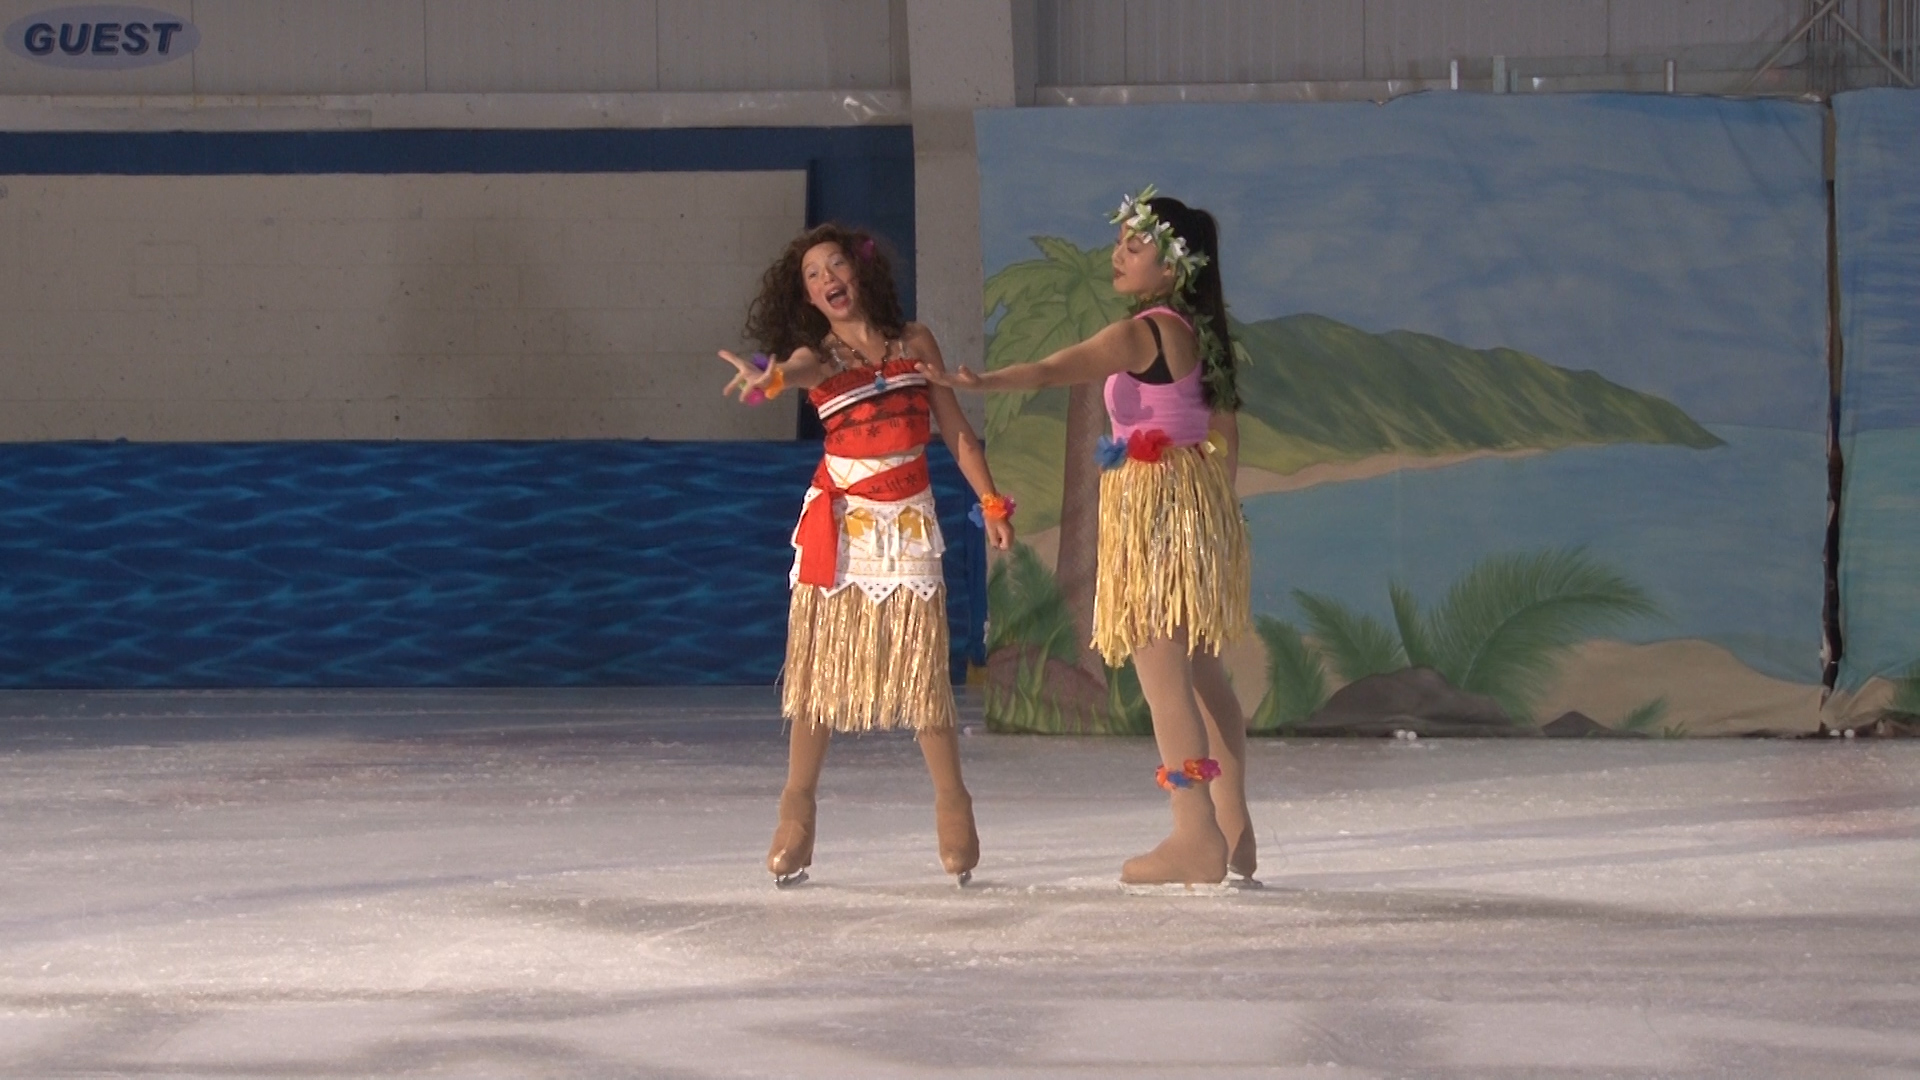 Power Play Maui Skate on Ice 071417.00_17_37_18.Still033.jpg